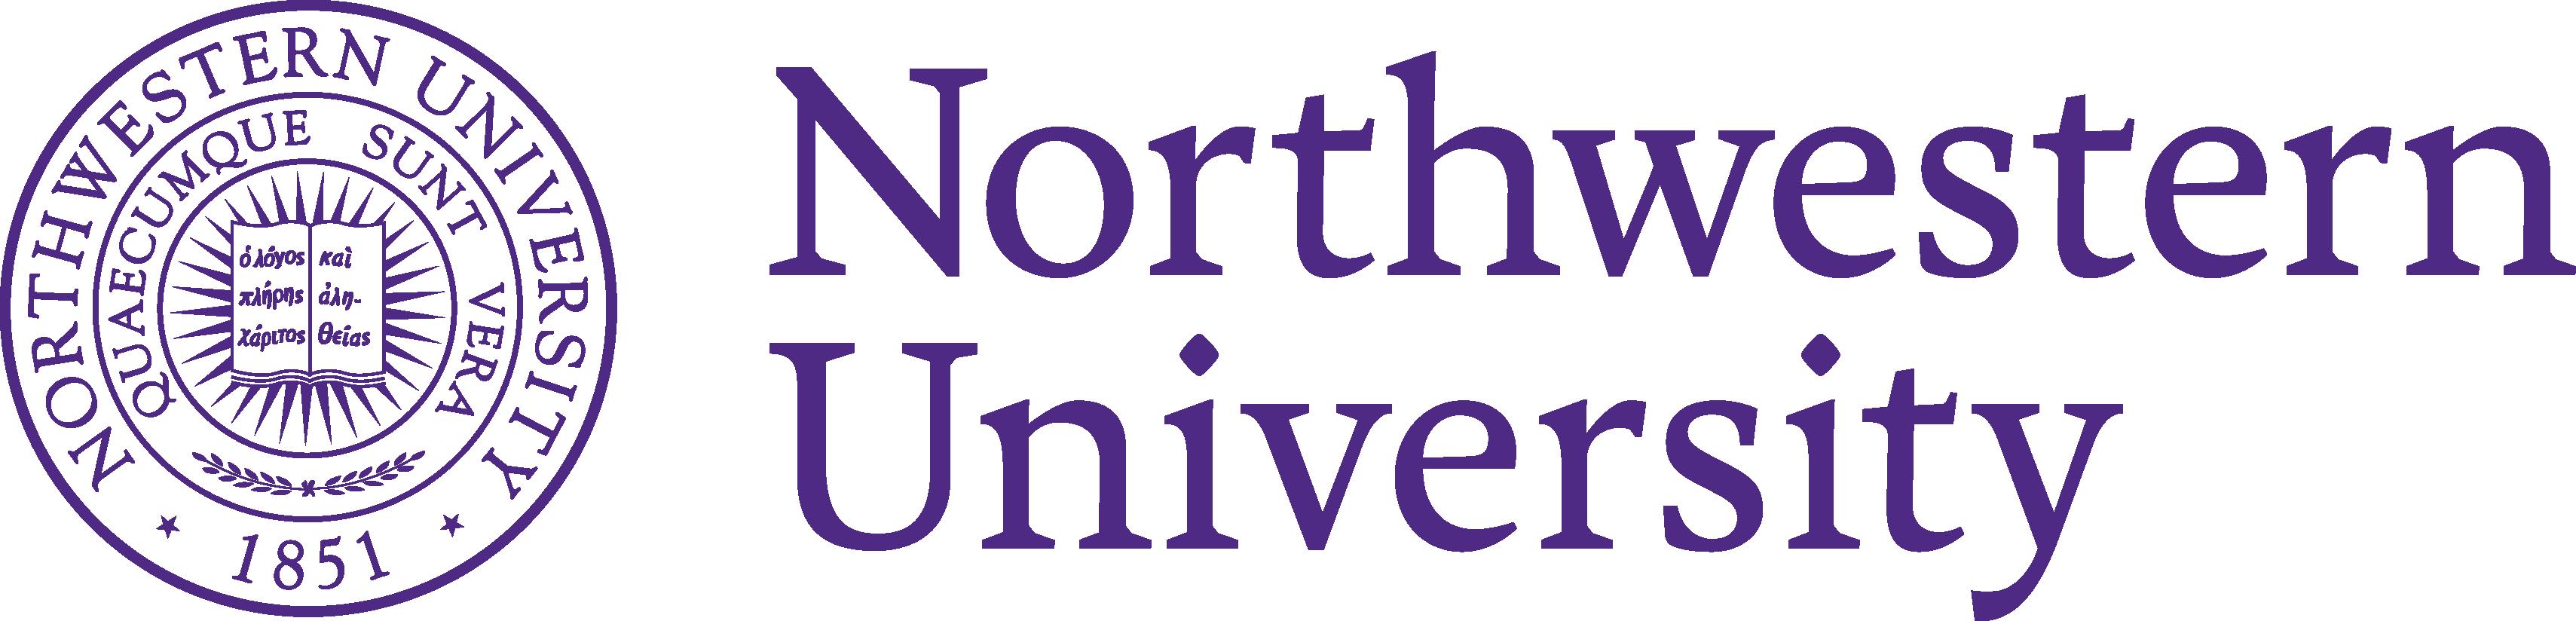 Northwestern Formal_horizontal